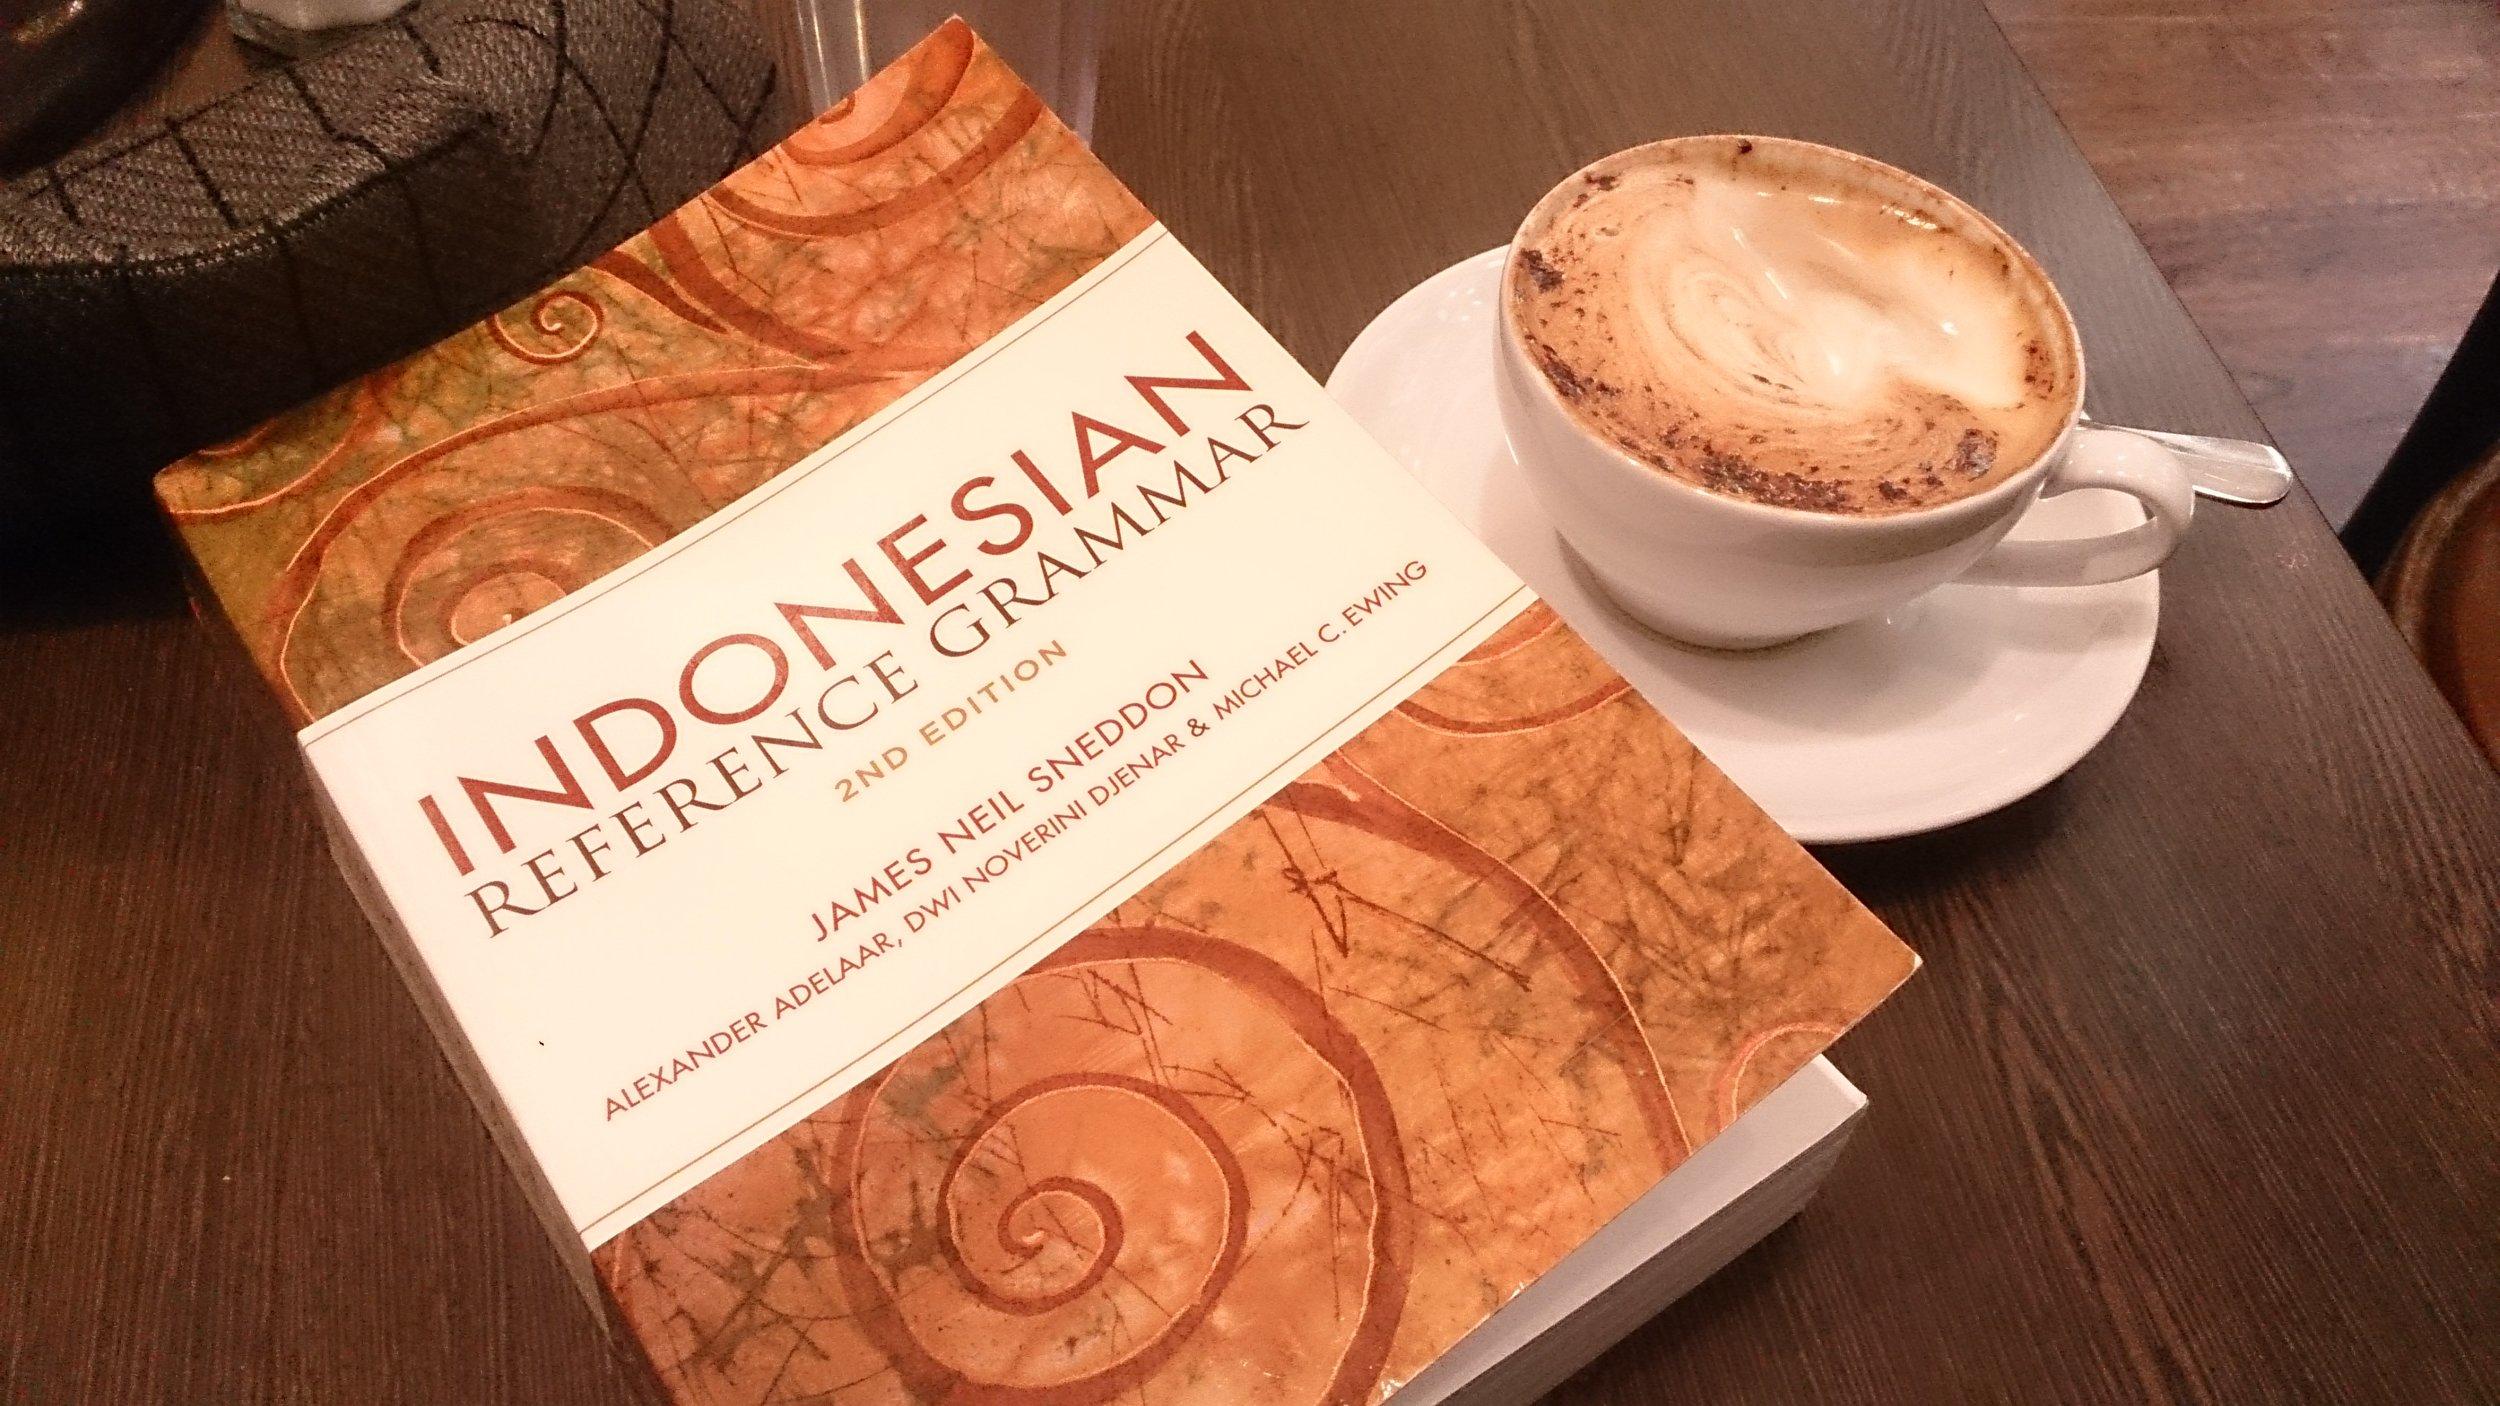 Coffee and study